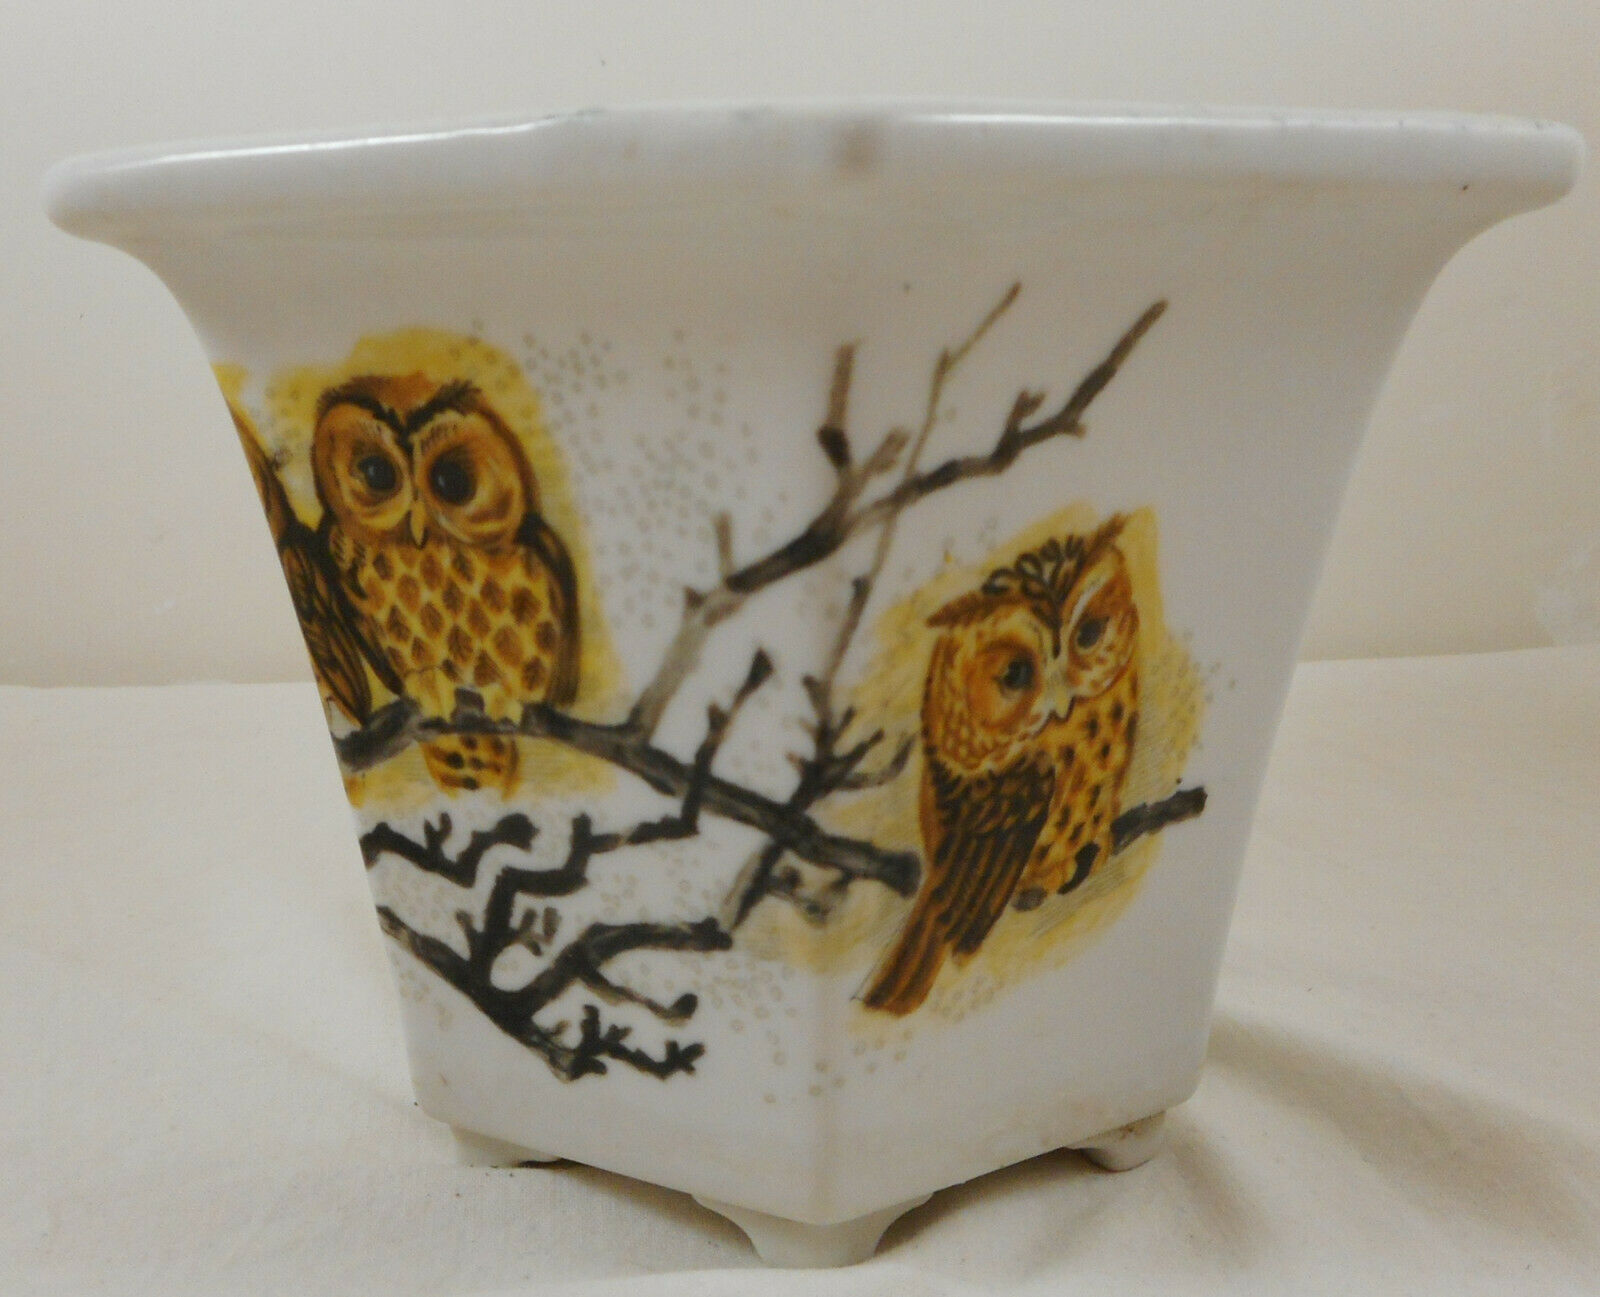 Six Sided Owl Planter Pot Vase White